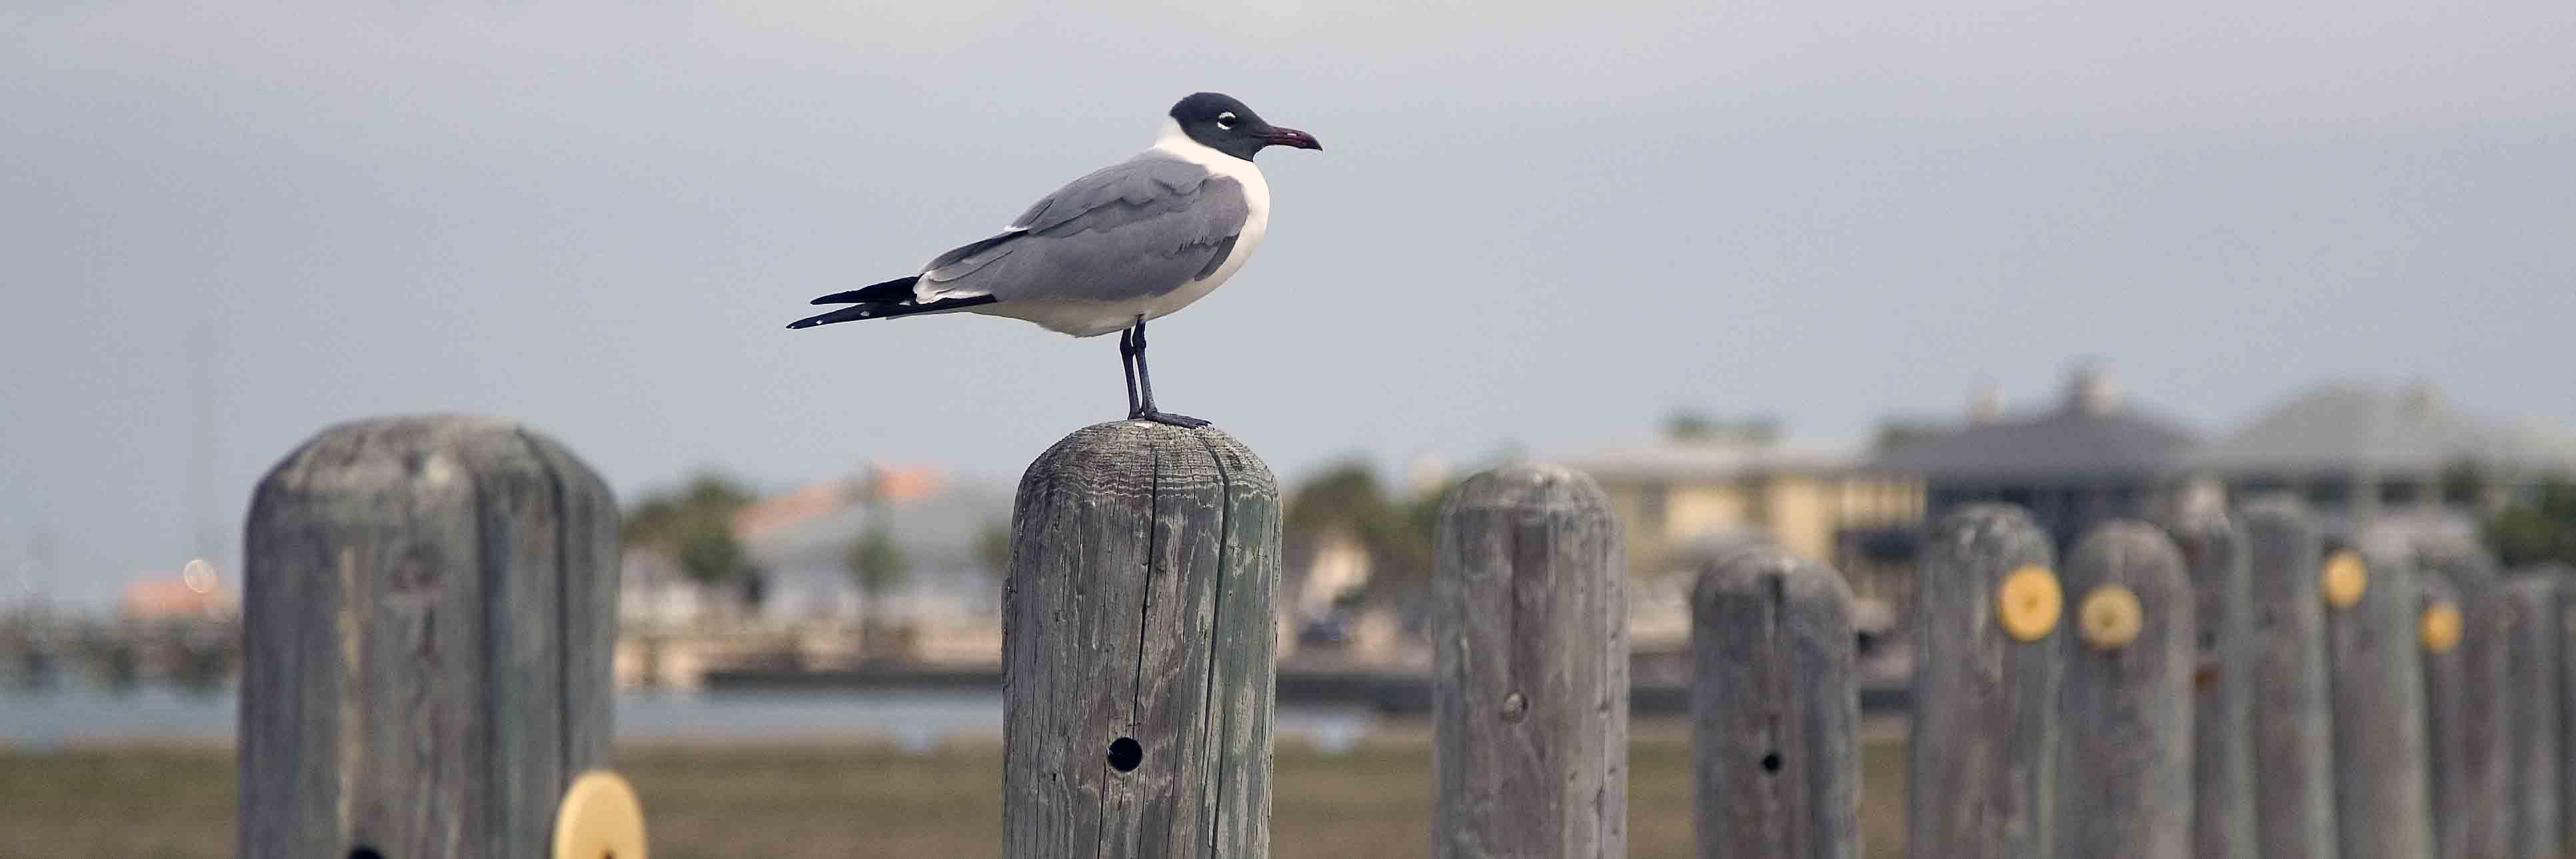 Bird on a post in Port Aransas Texas